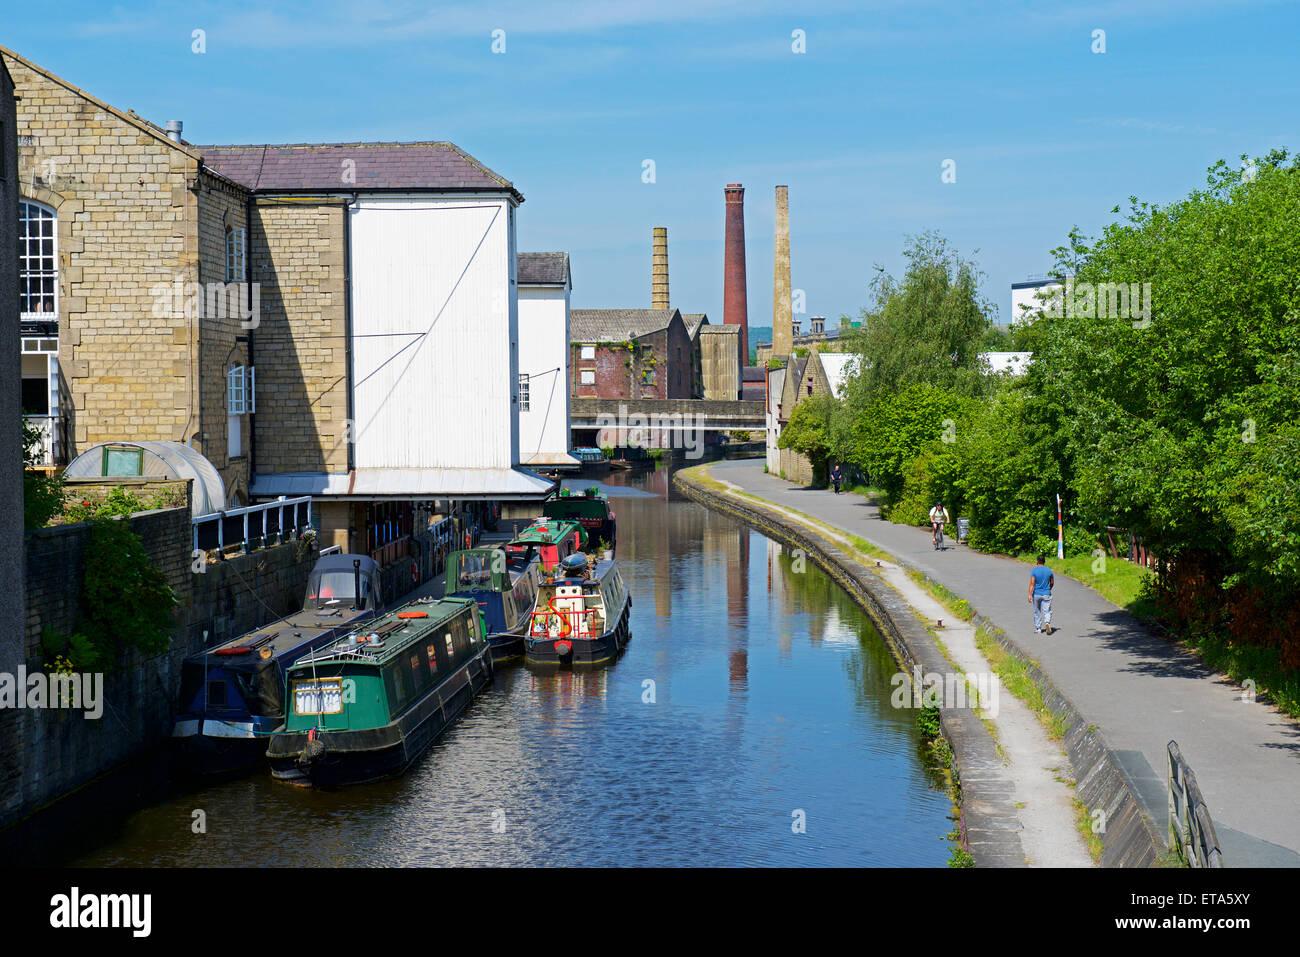 Has West Yorkshire Kingdom Shipley United industries